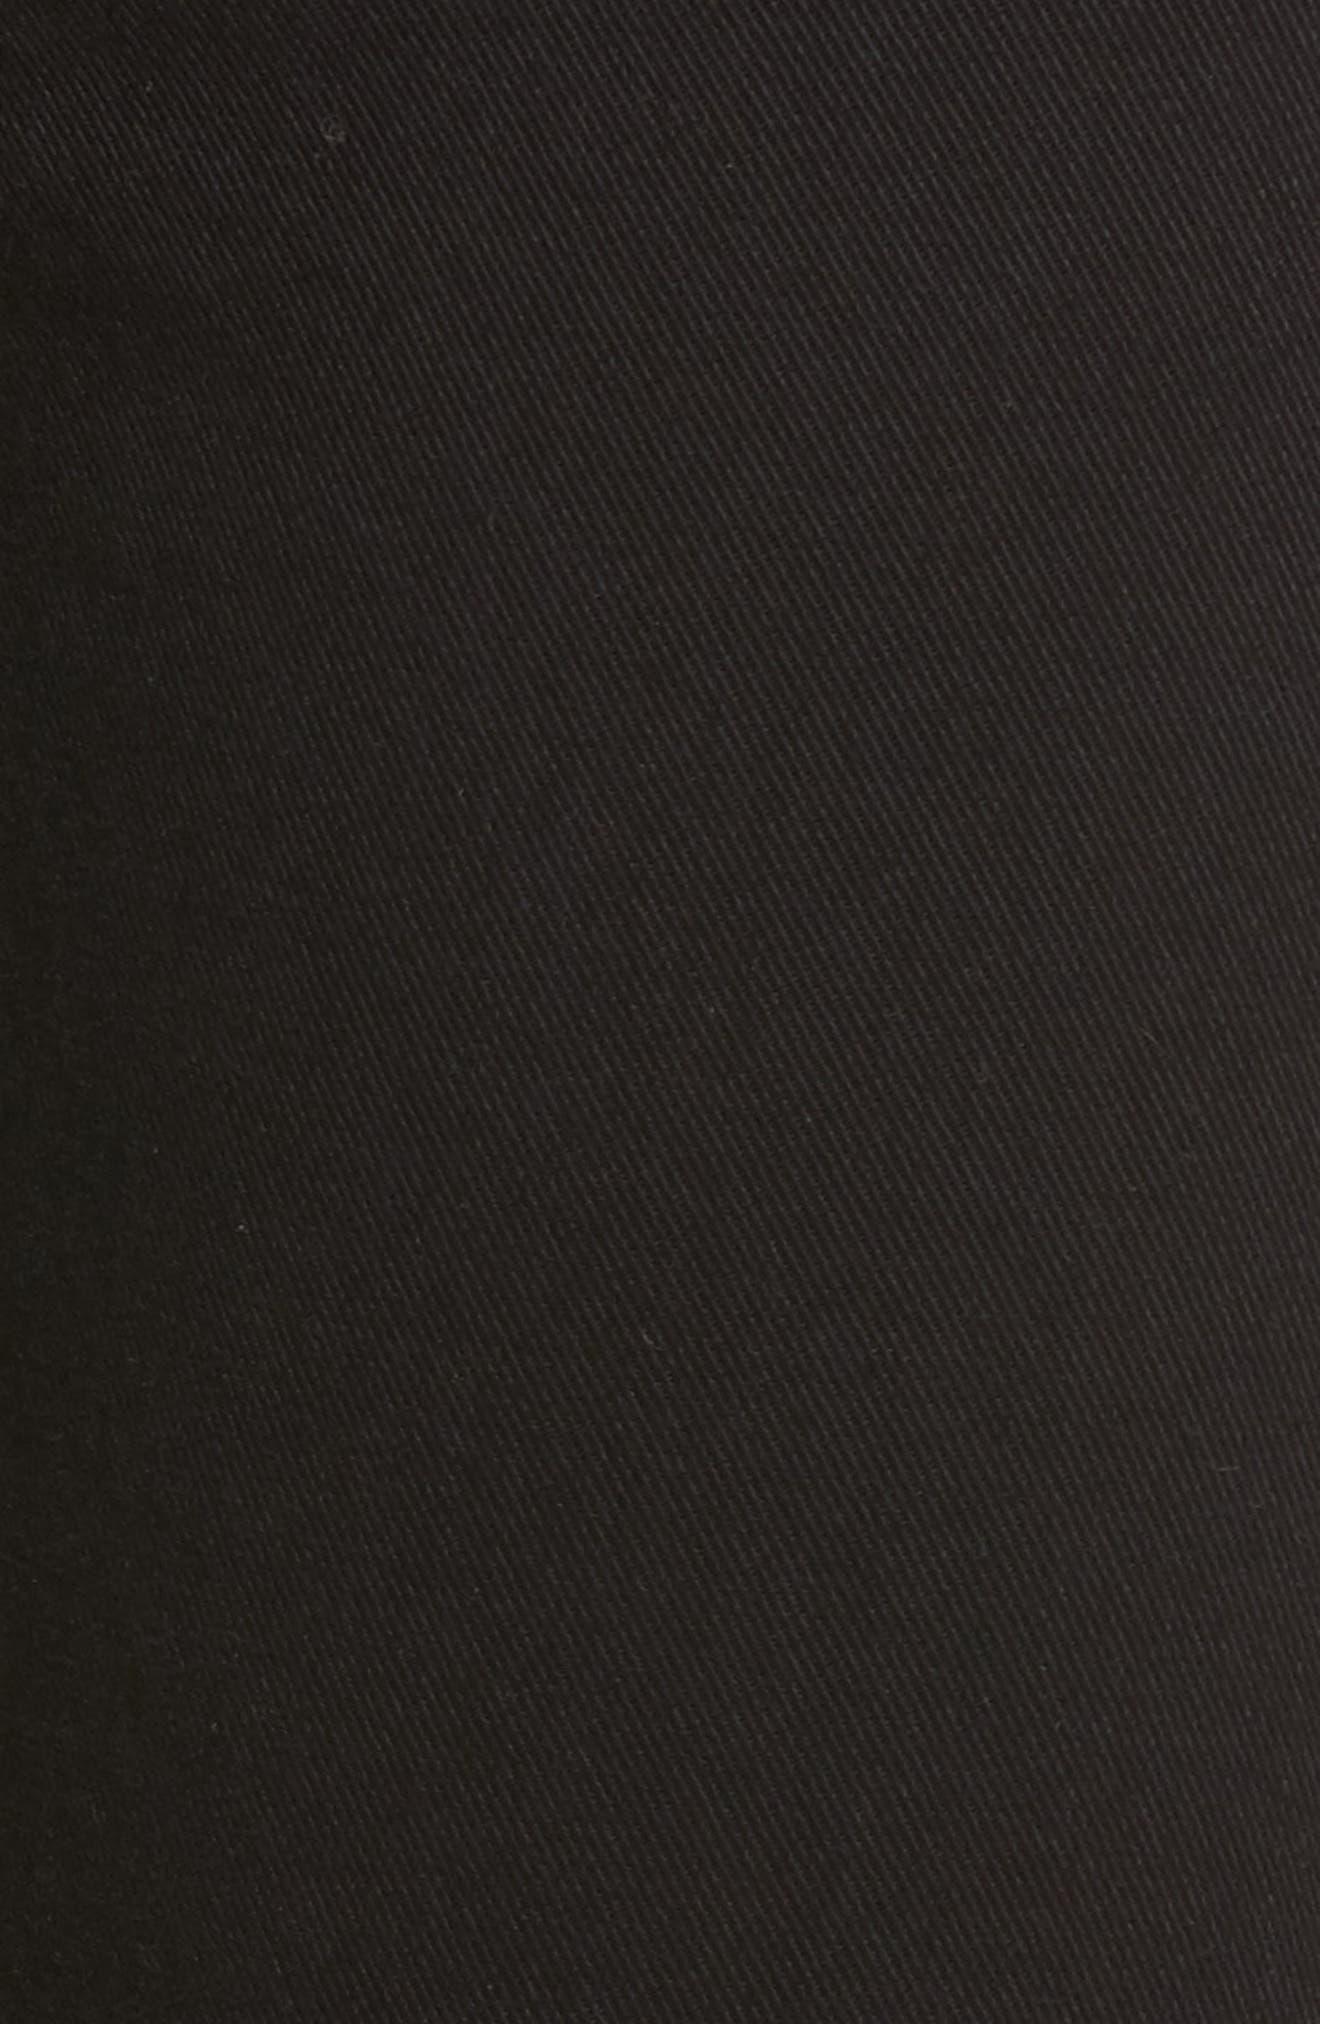 Embroidered & Studded Skinny Jeans,                             Alternate thumbnail 6, color,                             Hidden Talent Black